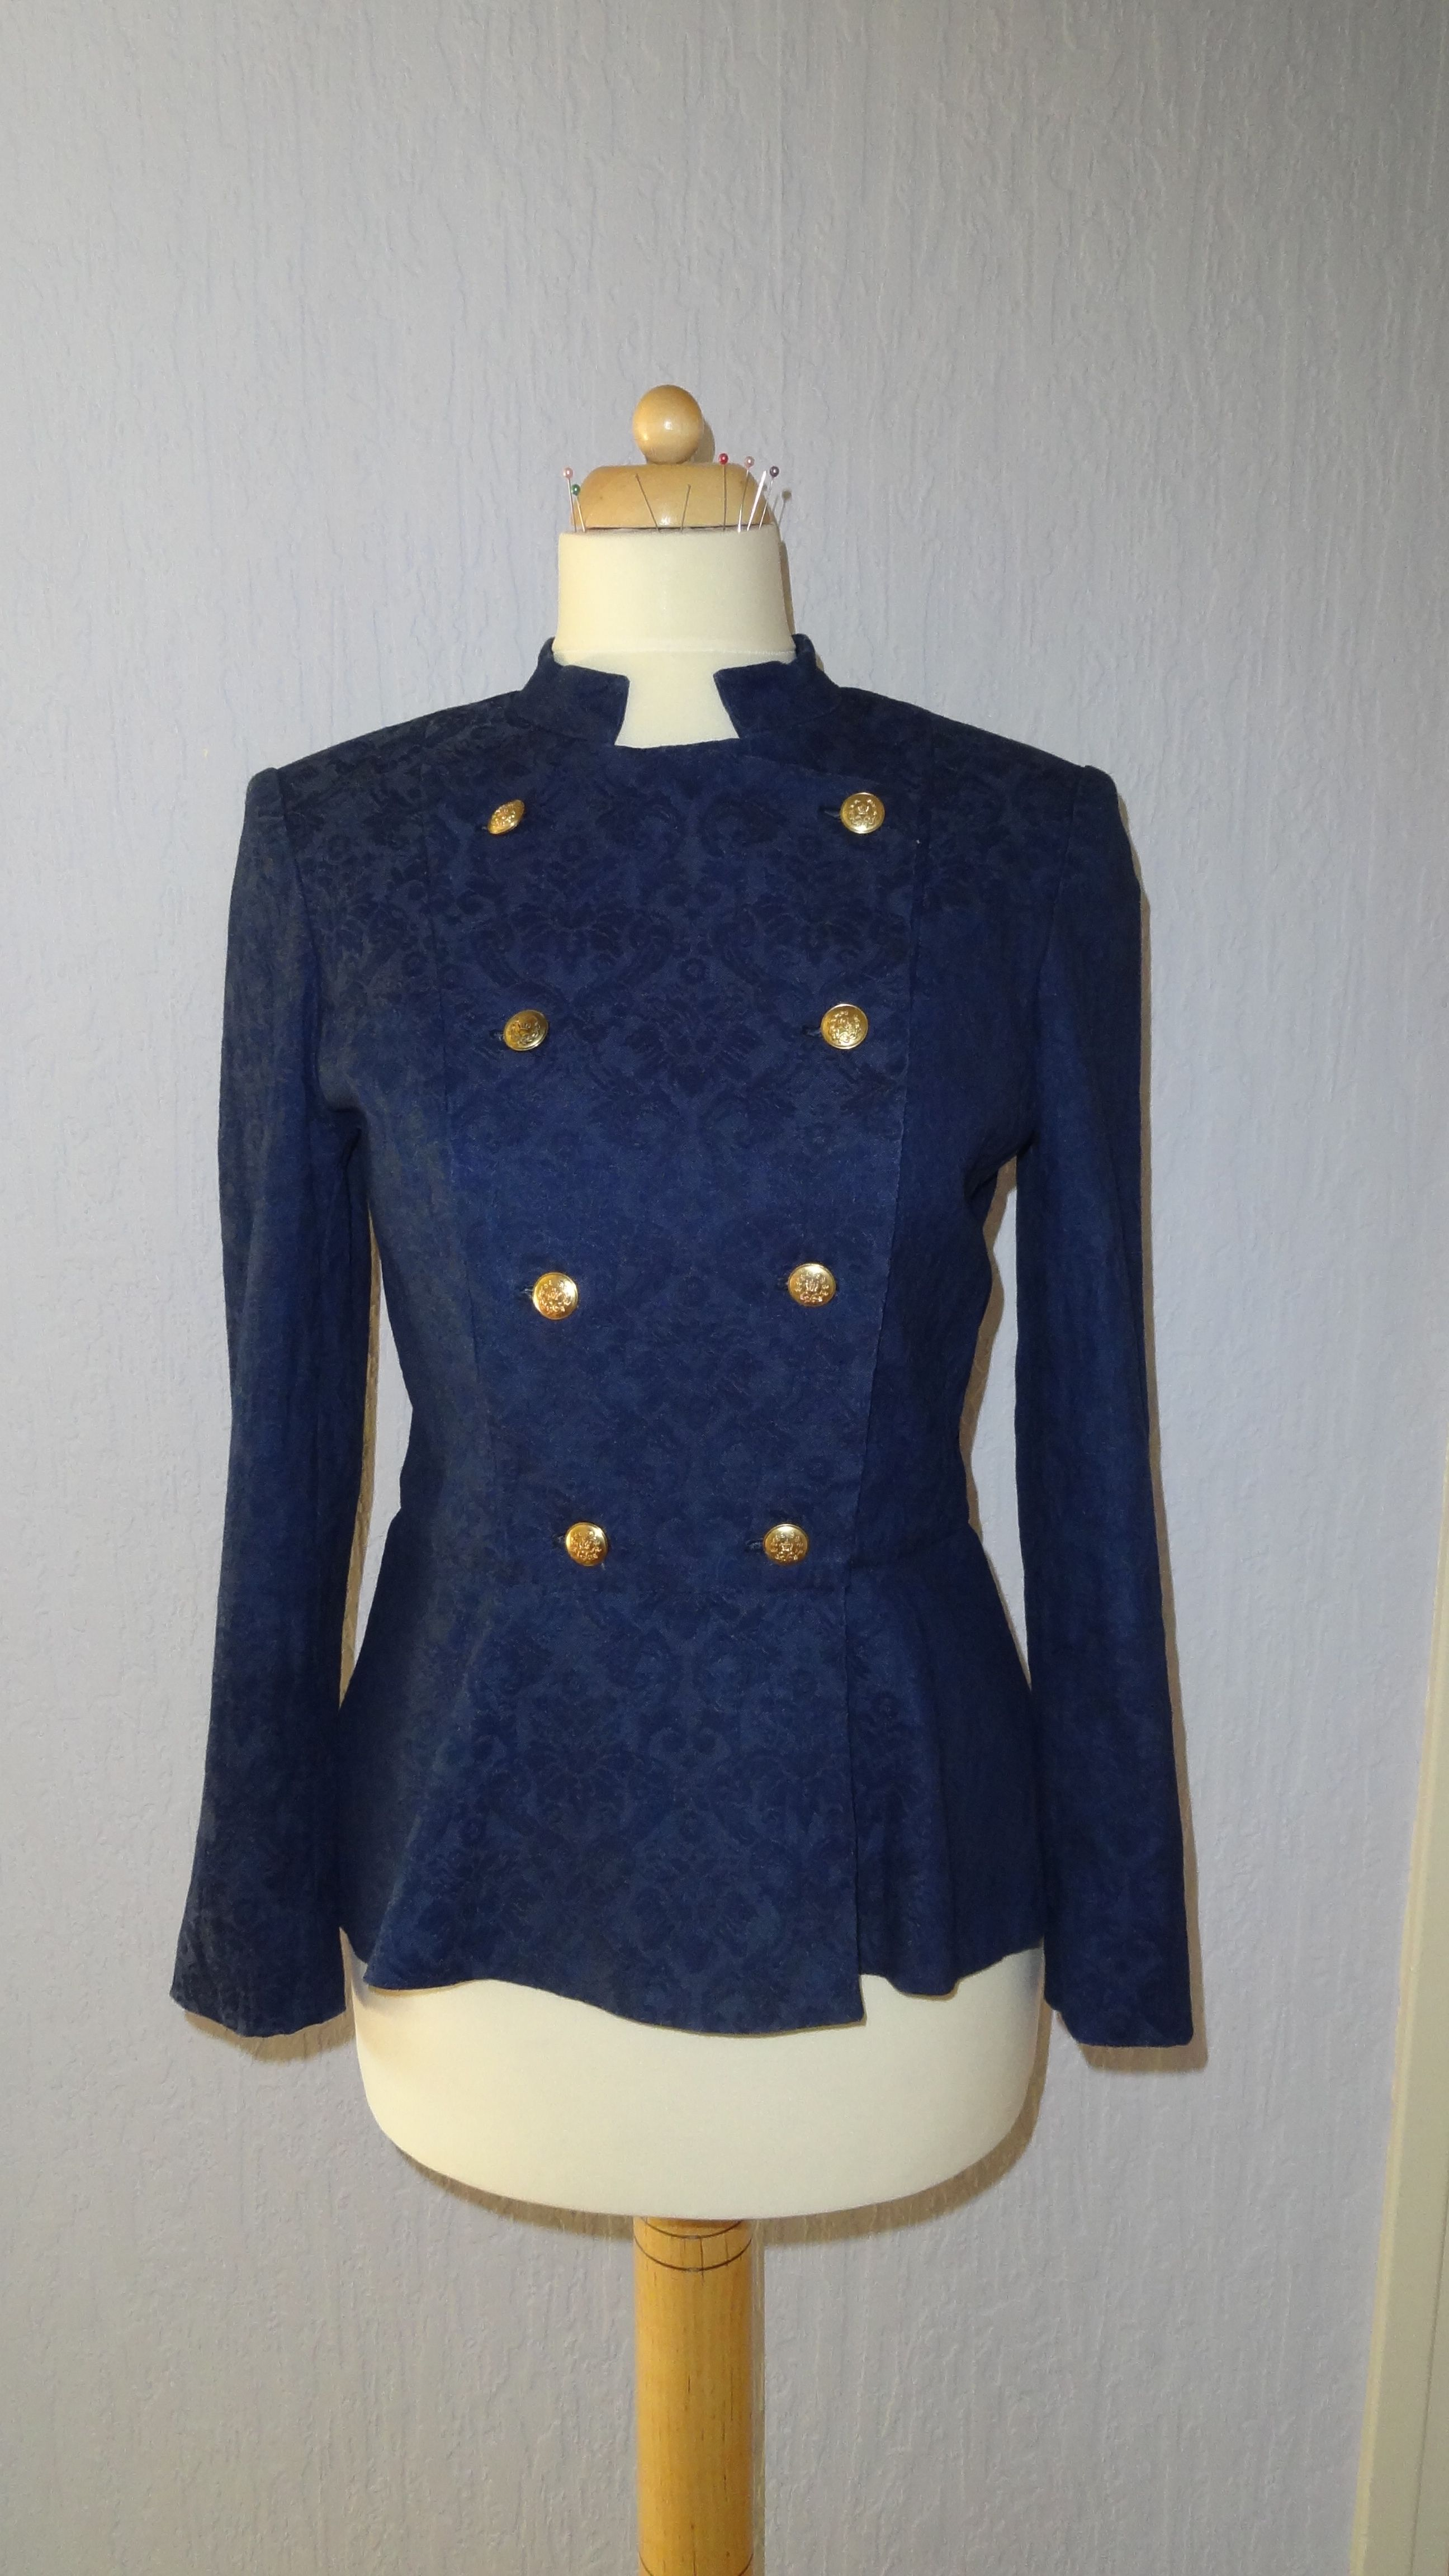 Military inspired jacket with peplum   Schnittmuster